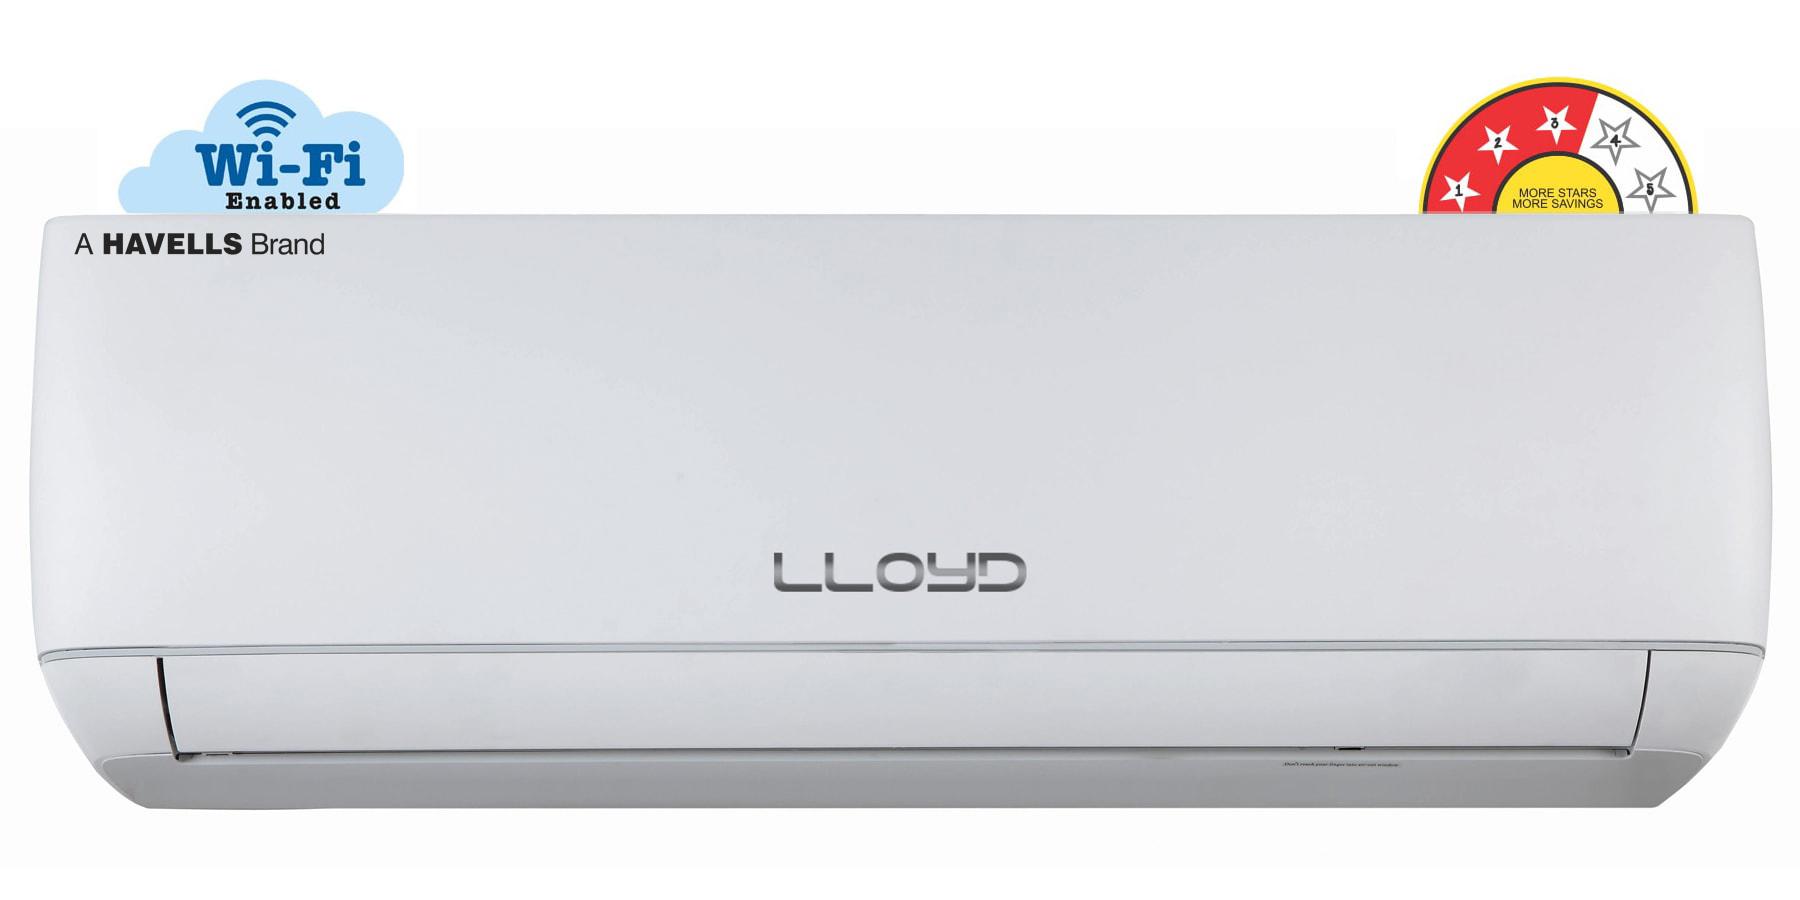 Buy Best Price Lloyd 1 Ton Split Air Conditioner Online - LS13B35JE